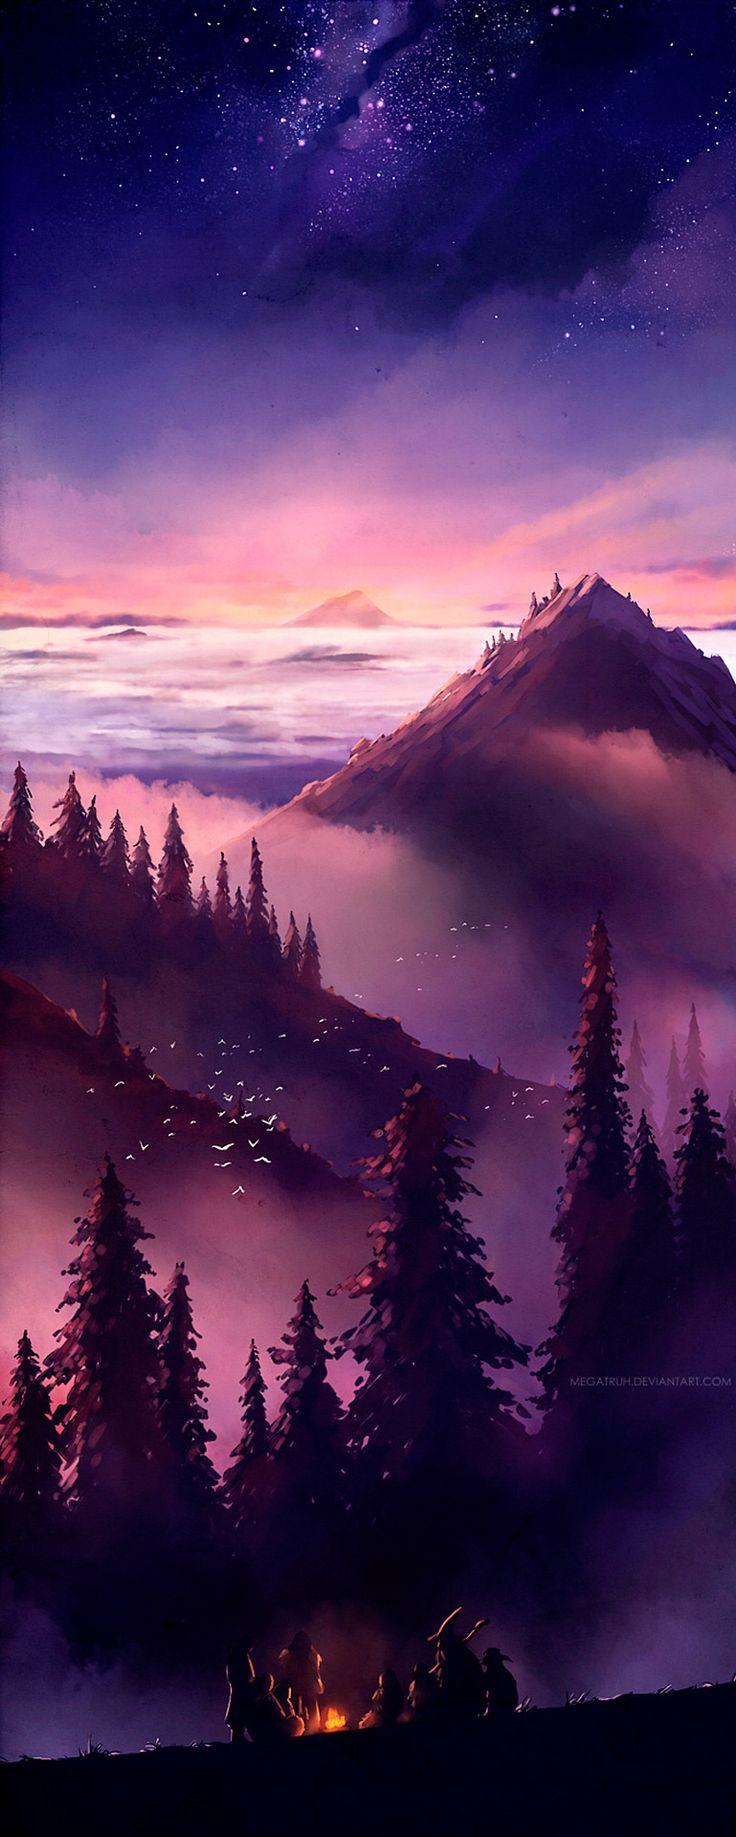 The Art Of Animation, Megatruh